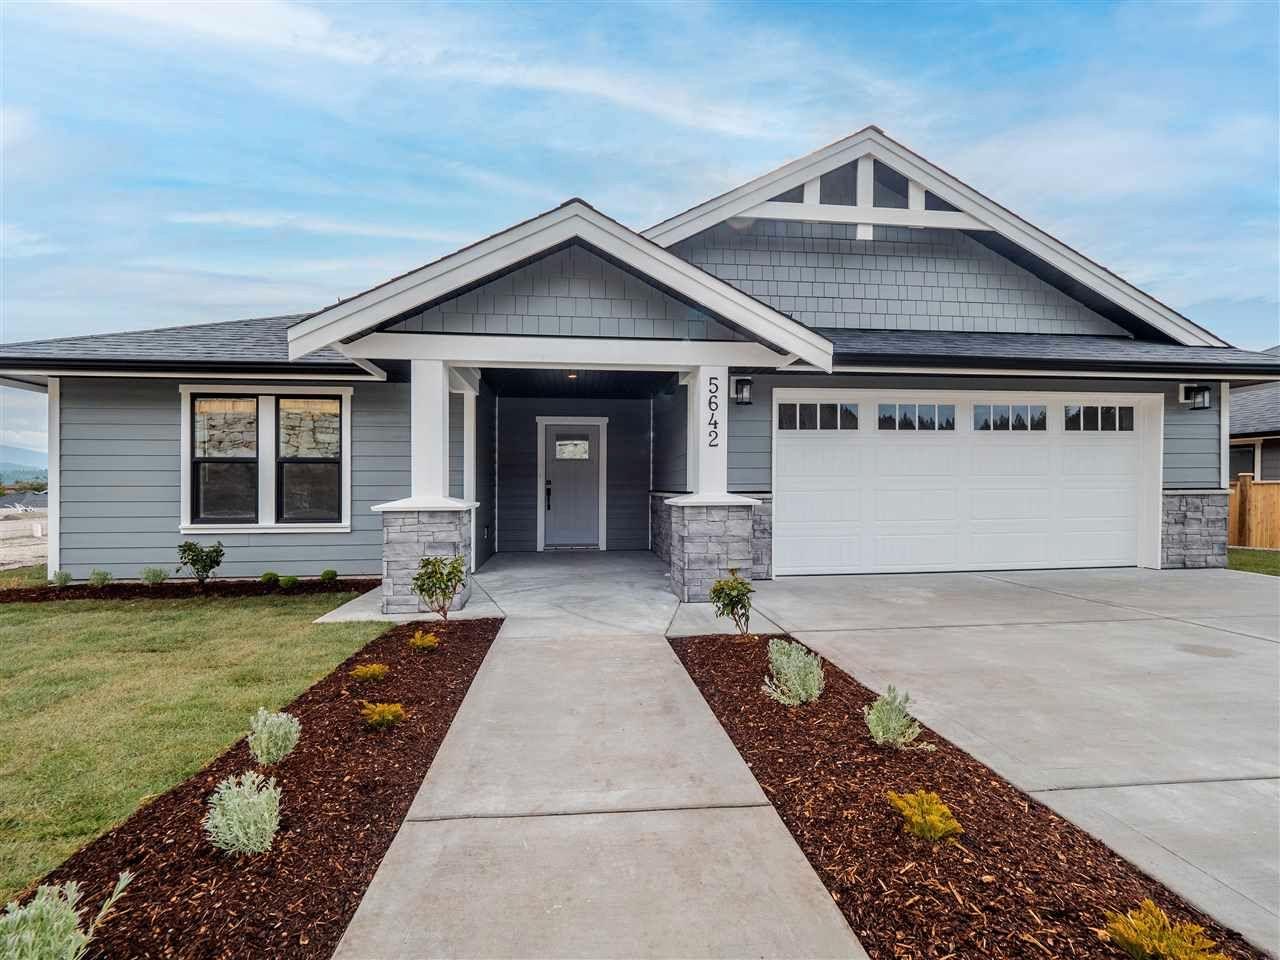 Main Photo: 5658 KINGBIRD Crescent in Sechelt: Sechelt District House for sale (Sunshine Coast)  : MLS®# R2609864